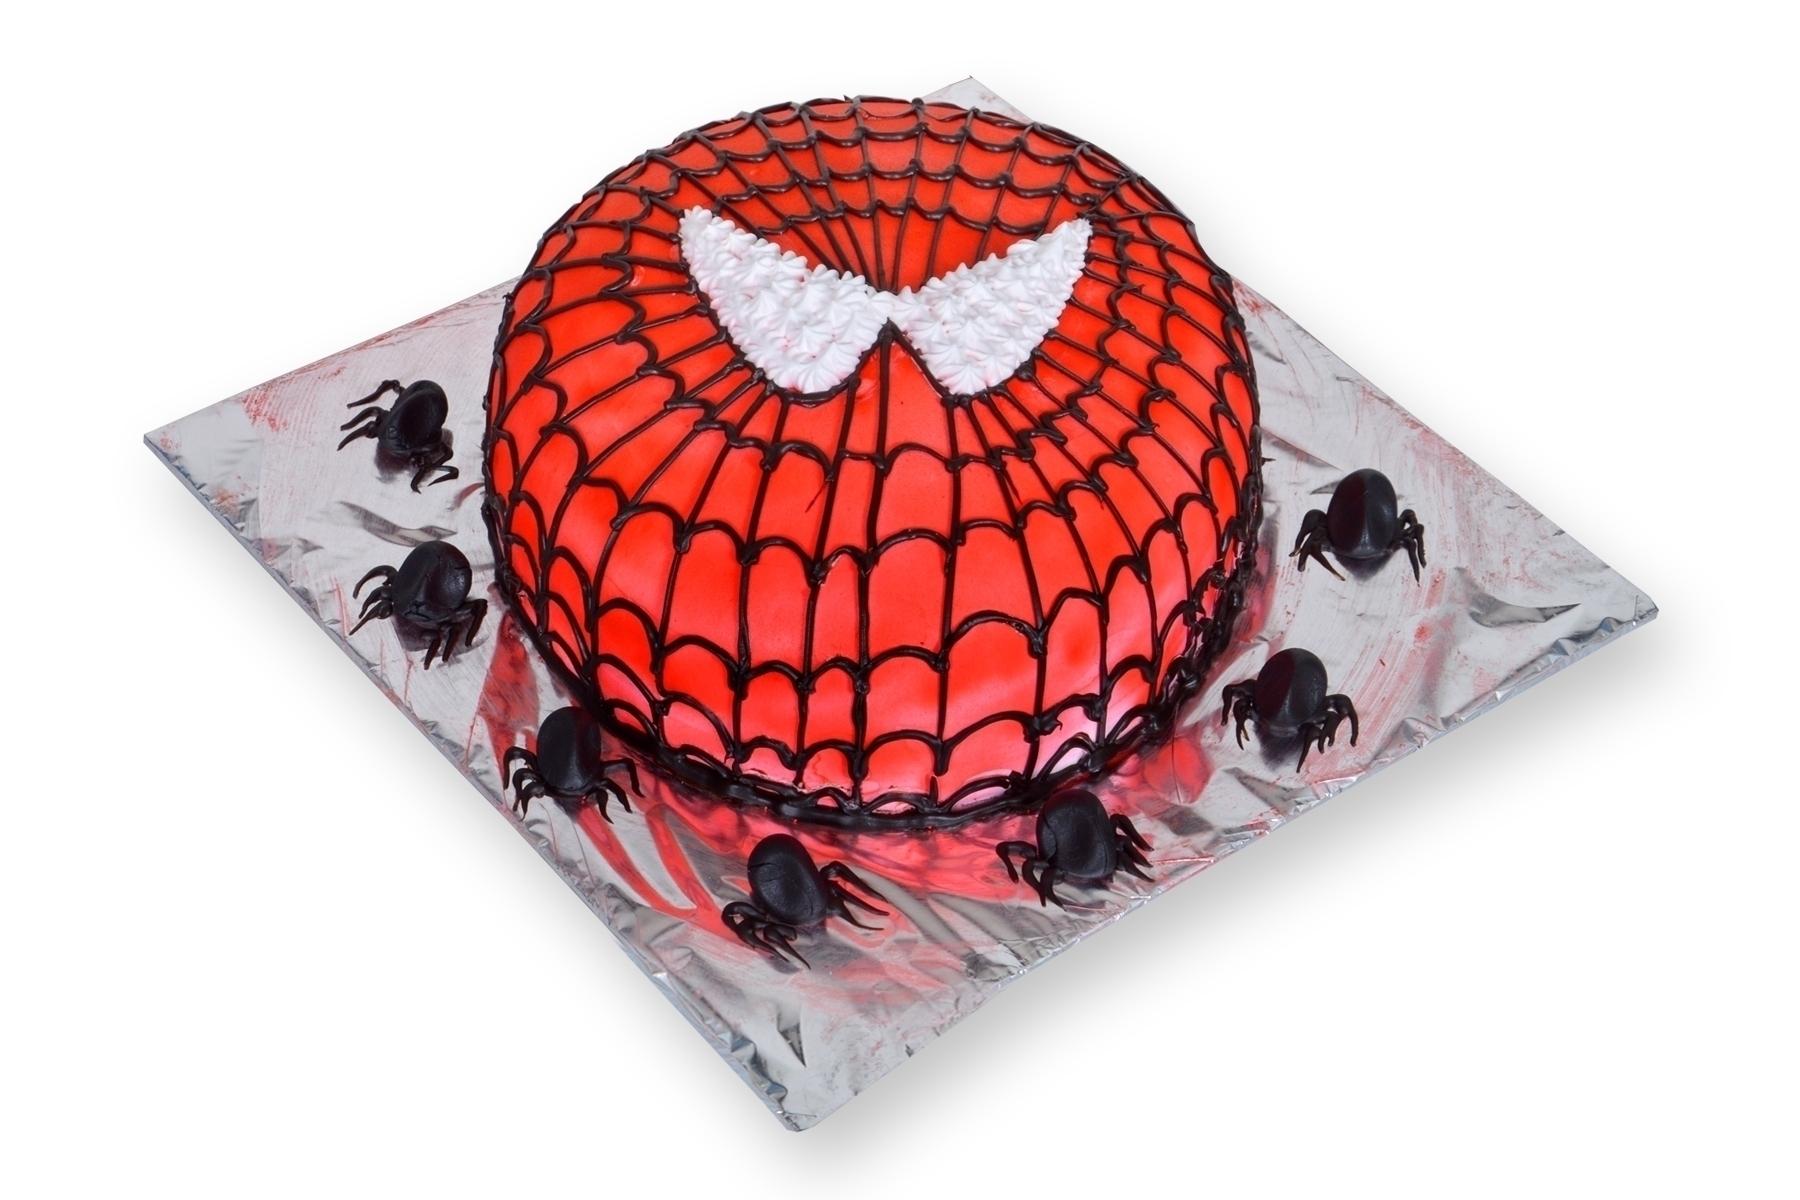 Spider Man Cake in Pune Designs, Images, Price